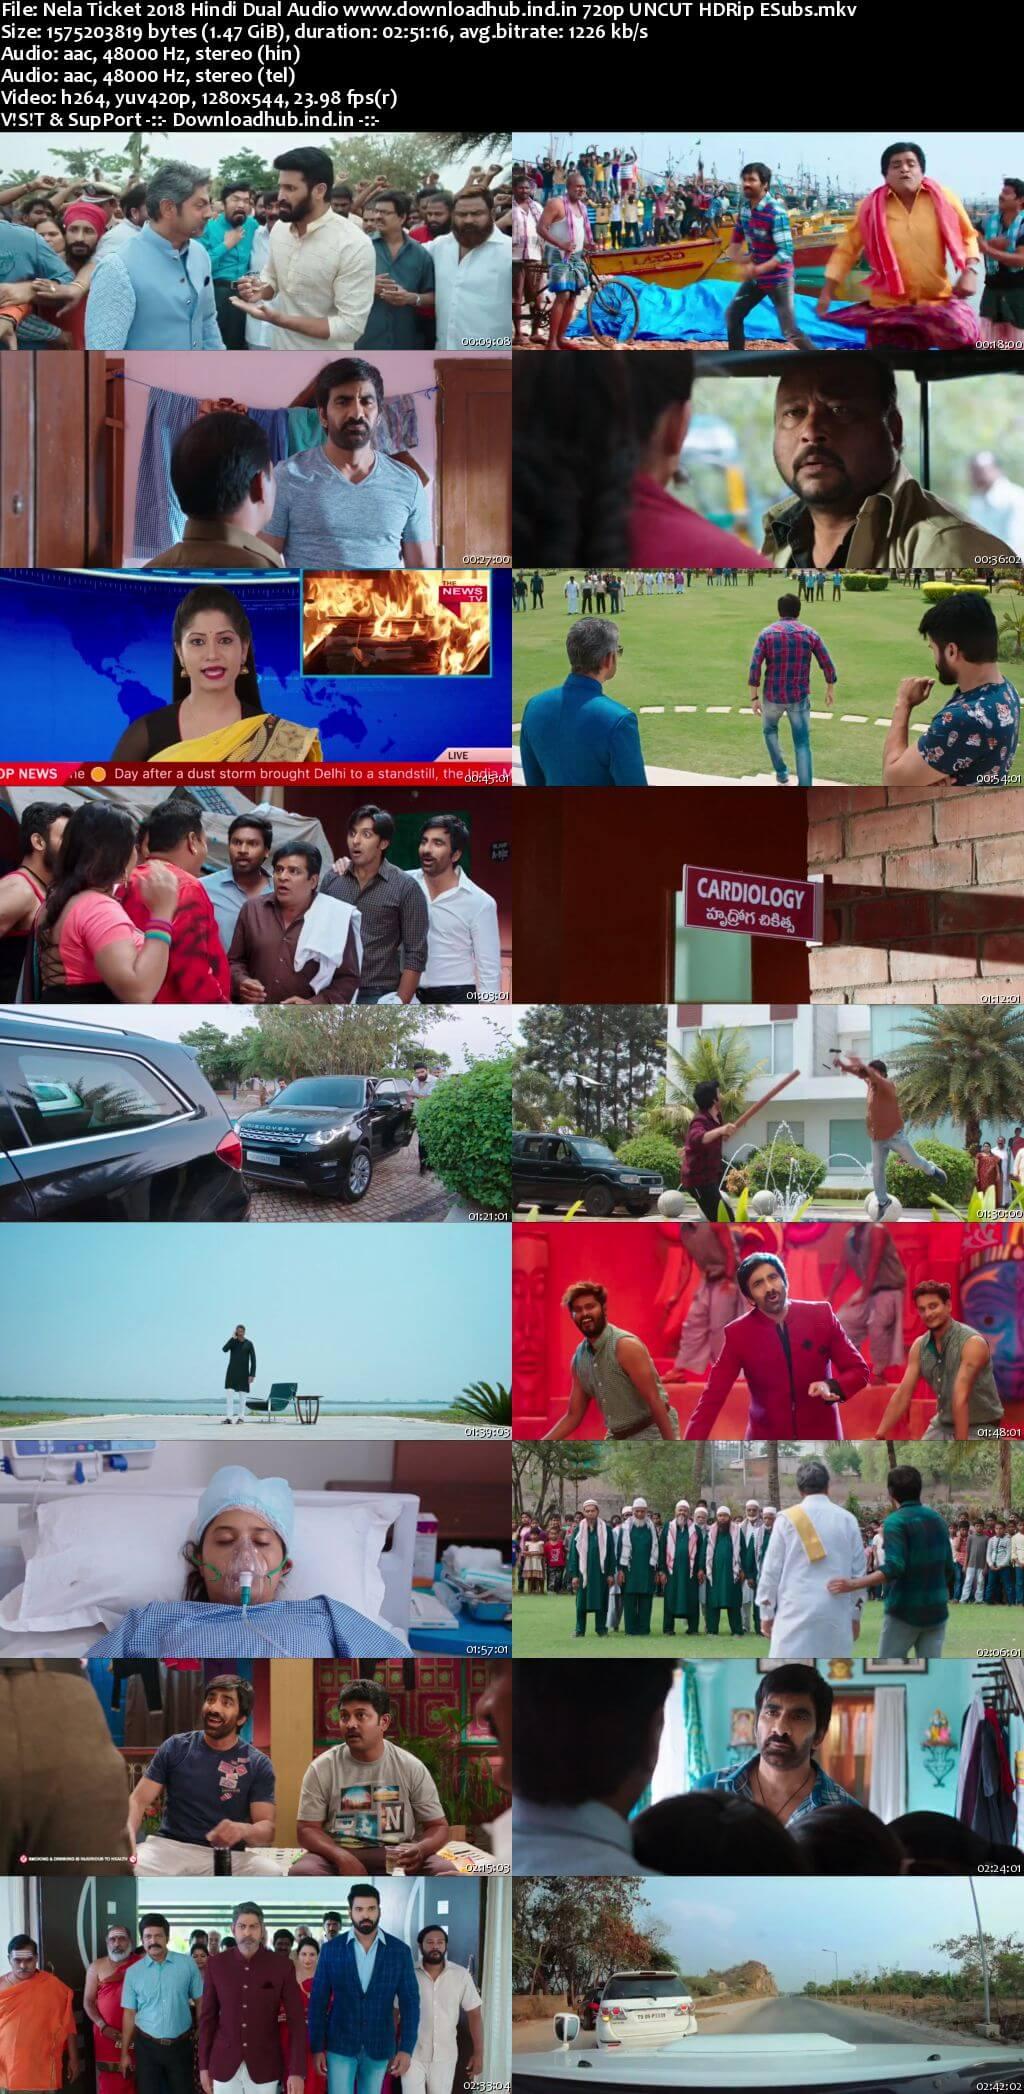 Nela Ticket 2018 Hindi Dual Audio 720p UNCUT HDRip ESubs